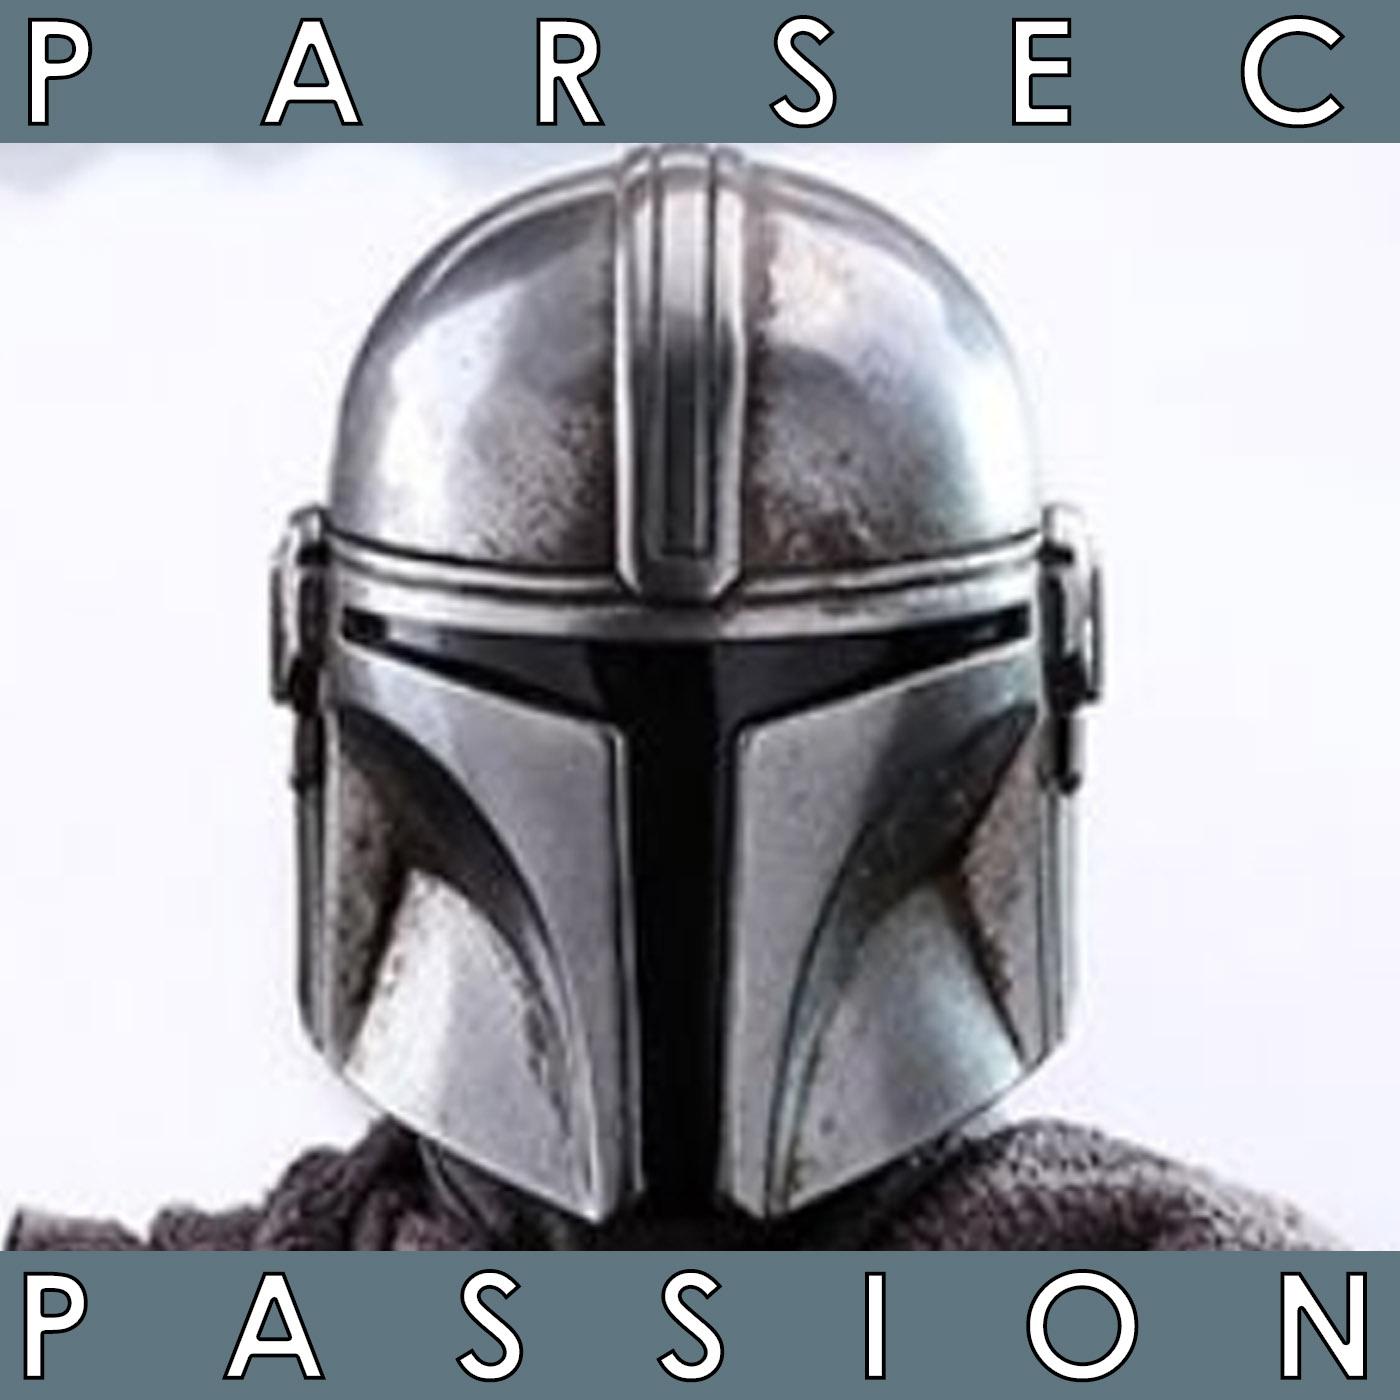 The Mandalorian Parsec Passion | Star Wars show art